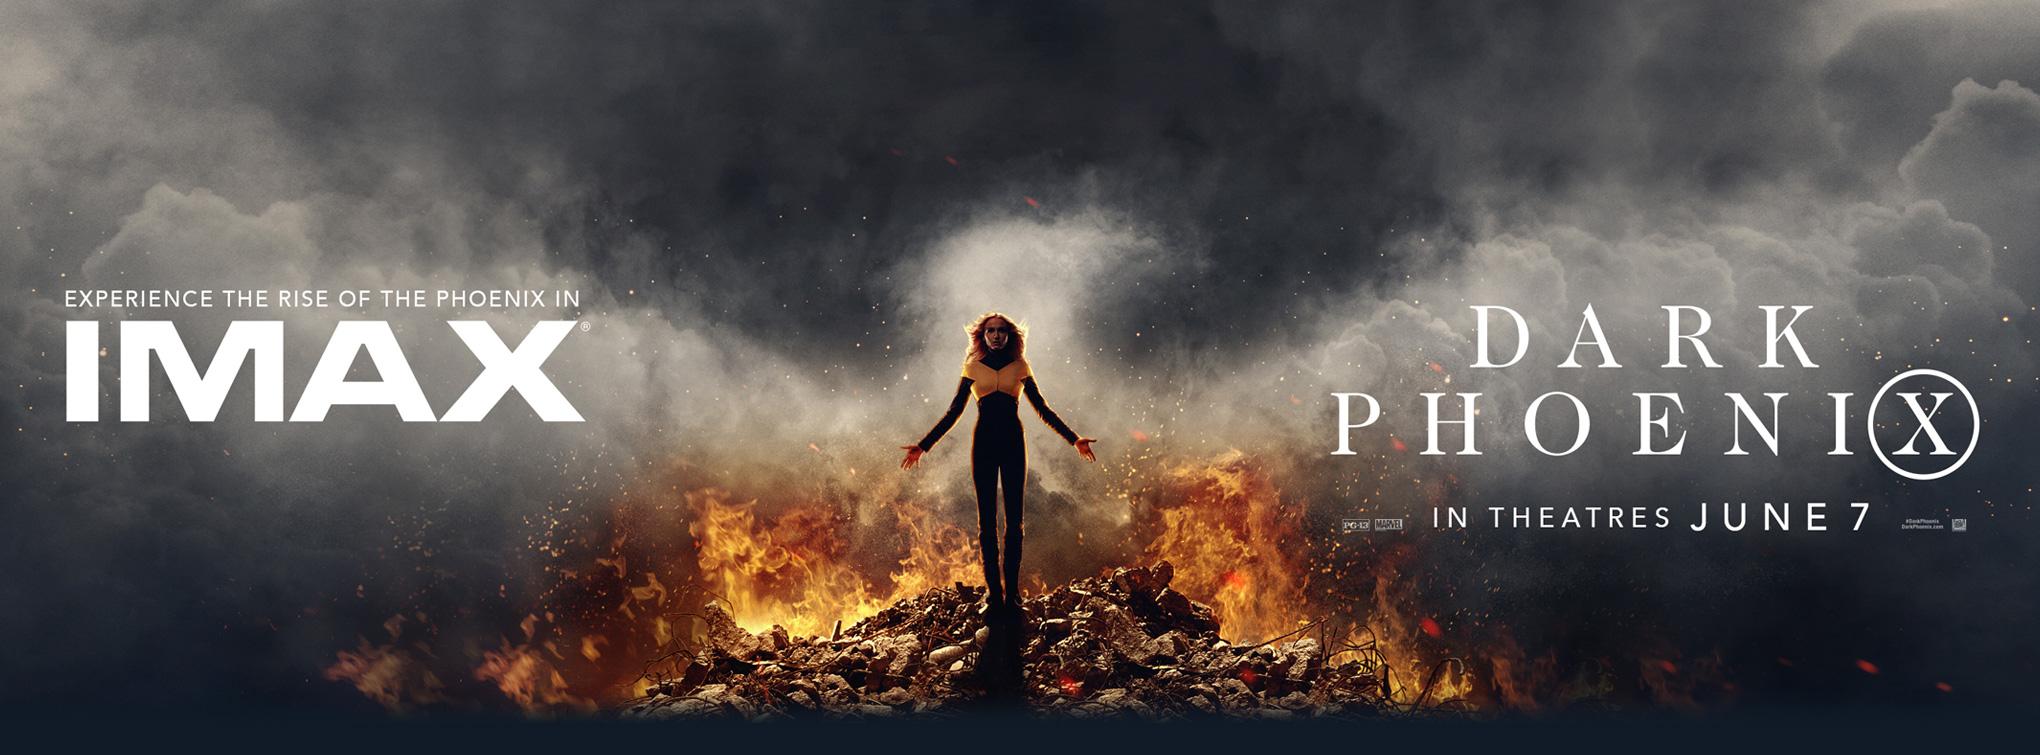 Slider image for Dark Phoenix